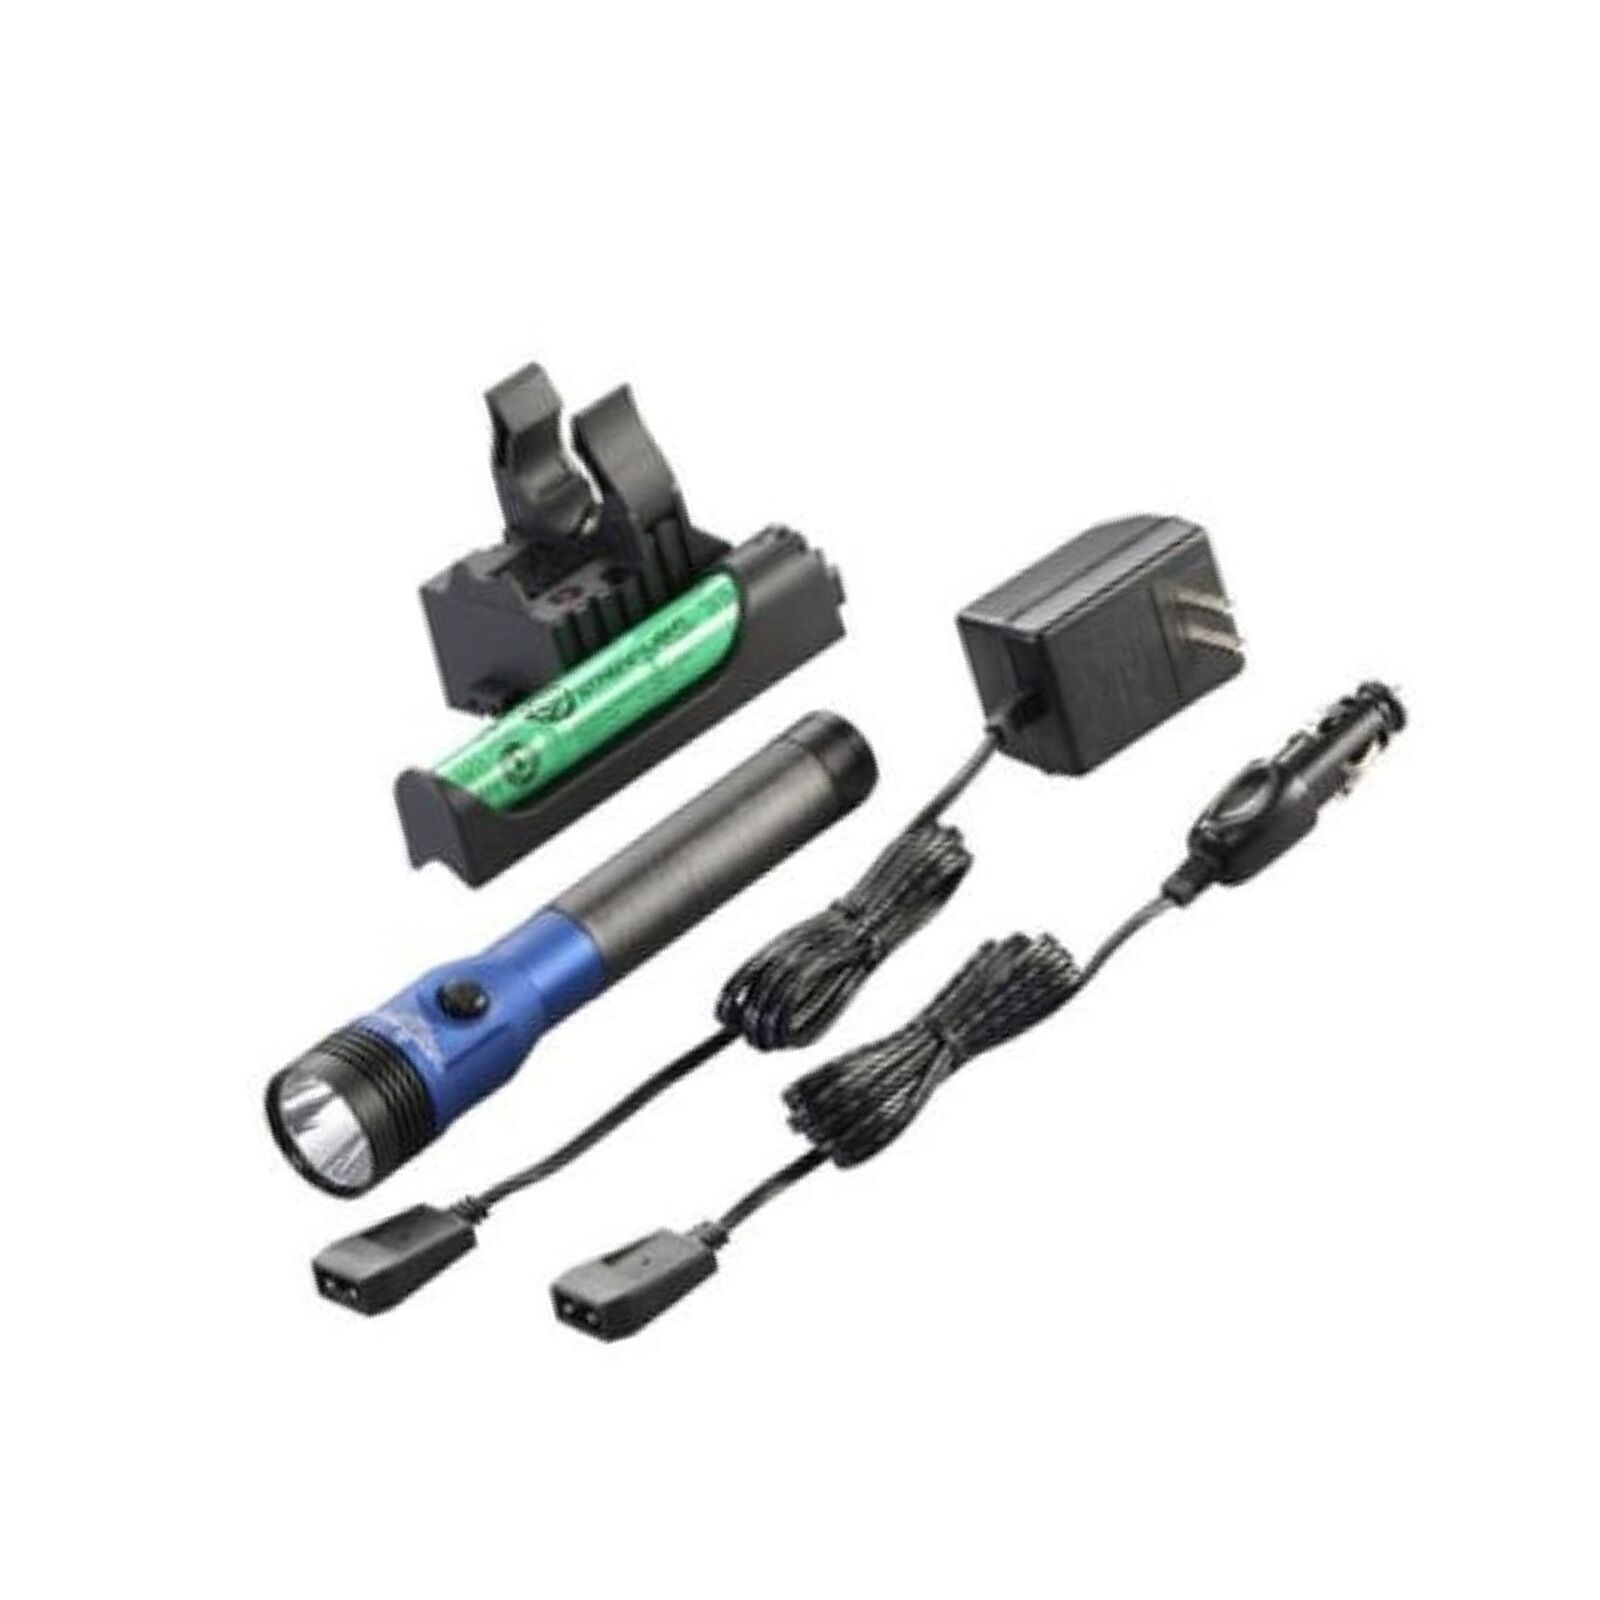 Streamlight Stinger LED HL Rechargeable Flashlight 75476 w/ Charger (Blau) 75476 Flashlight NEW 4b7da8